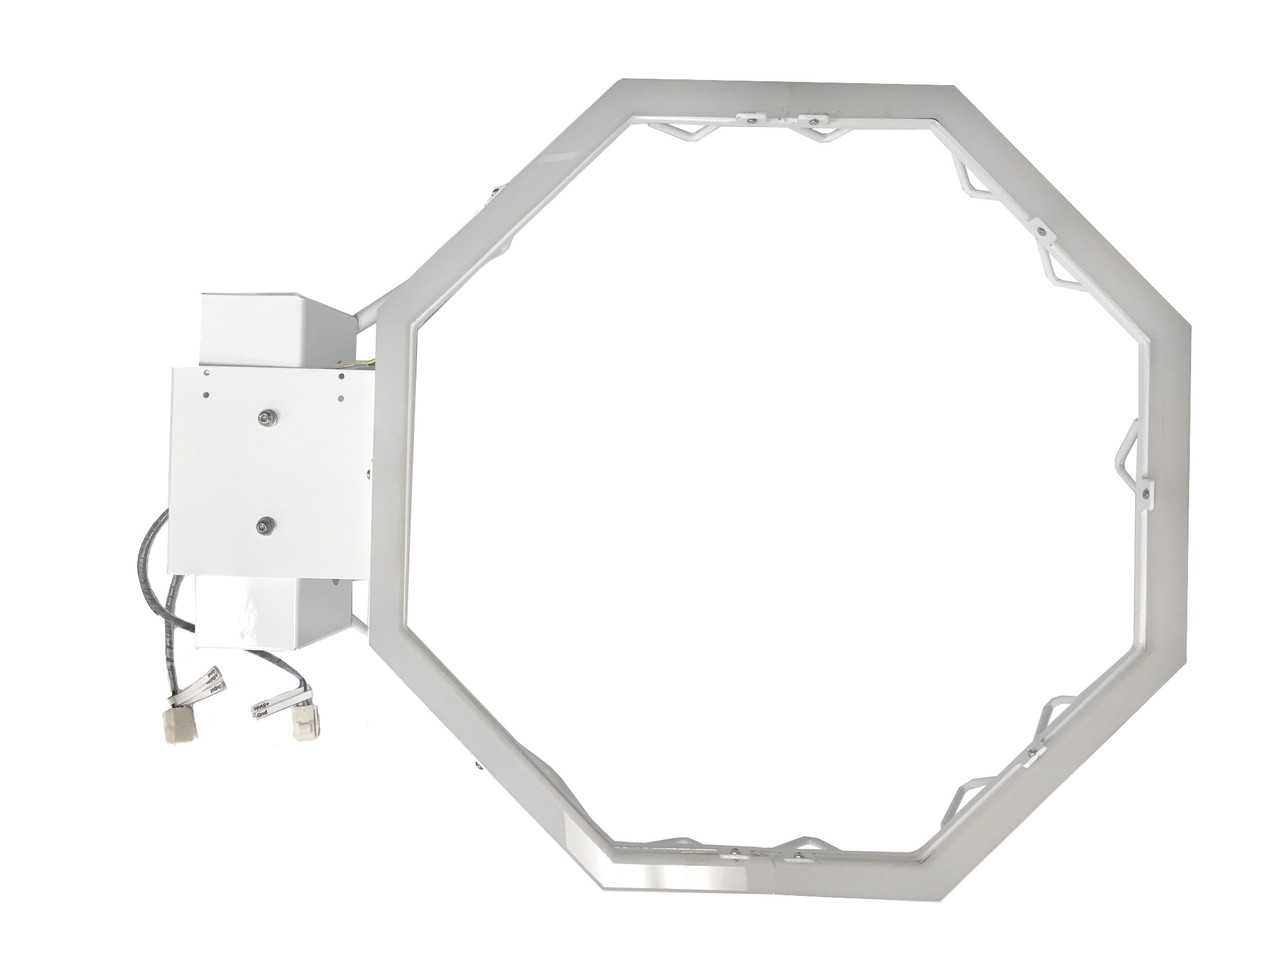 HYPERshoot Octagonal Hoop Assembly (HSH-ASSY-024-R1)